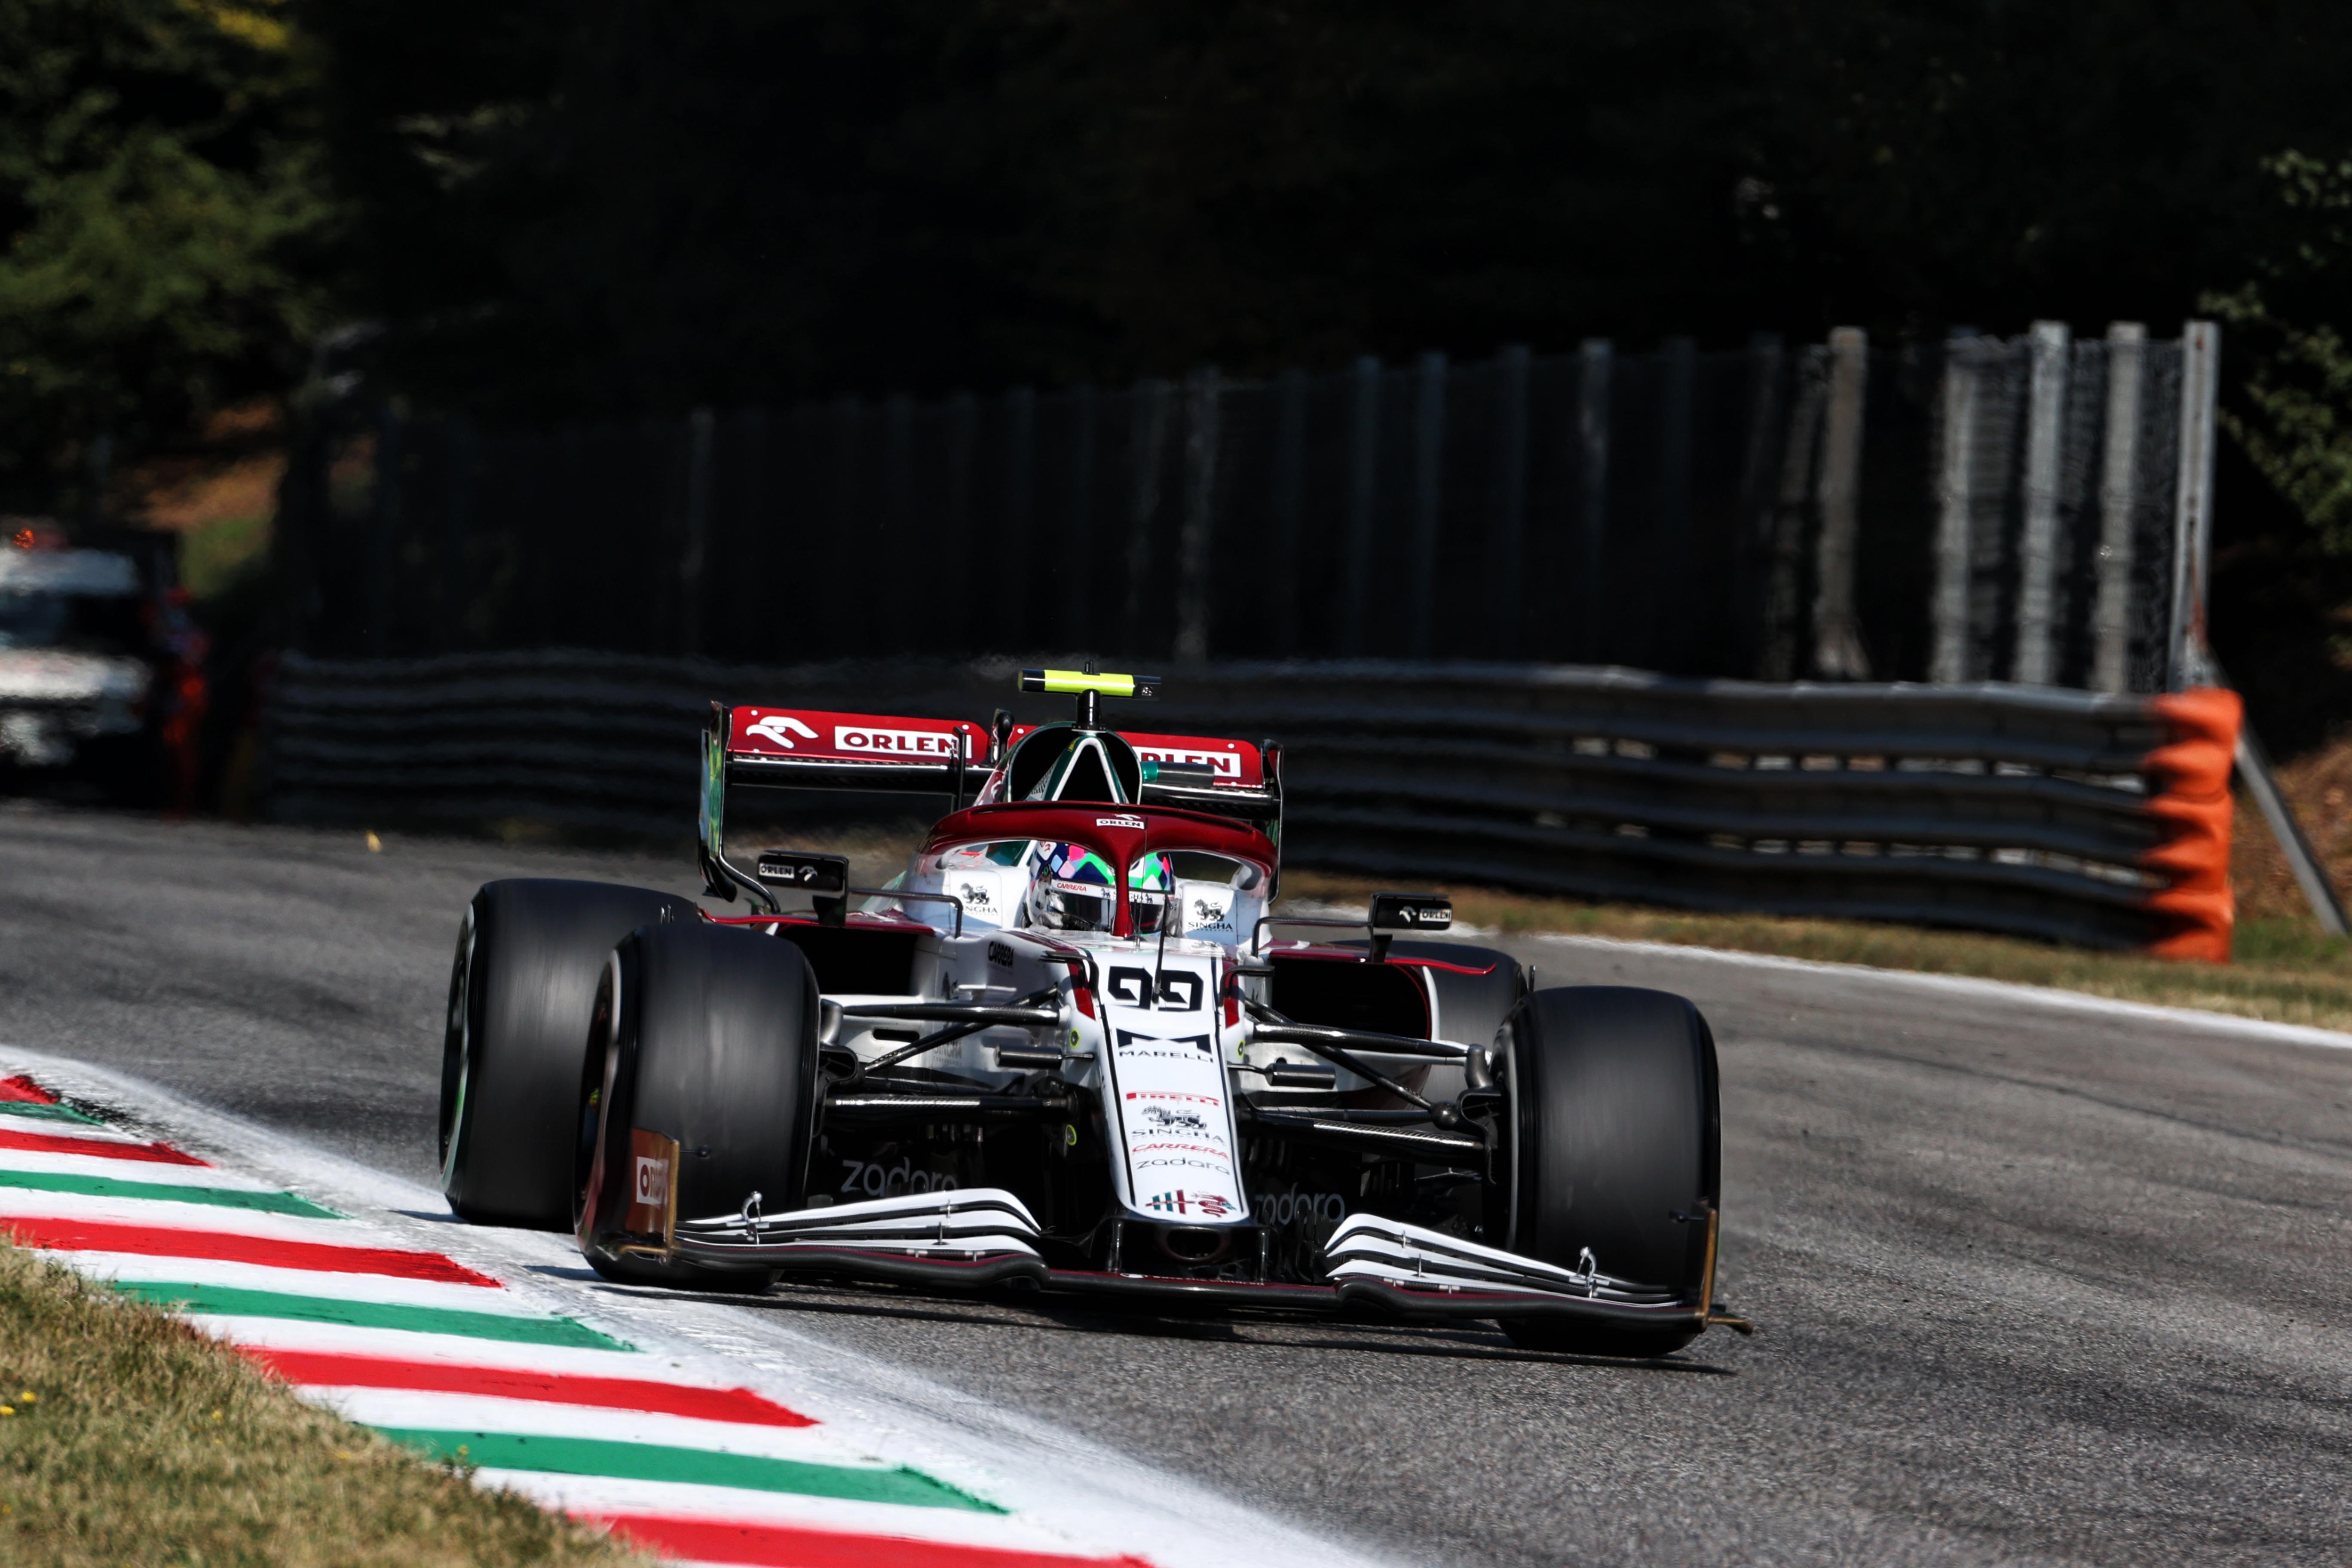 Motor Racing Formula One World Championship Italian Grand Prix Race Day Monza, Italy